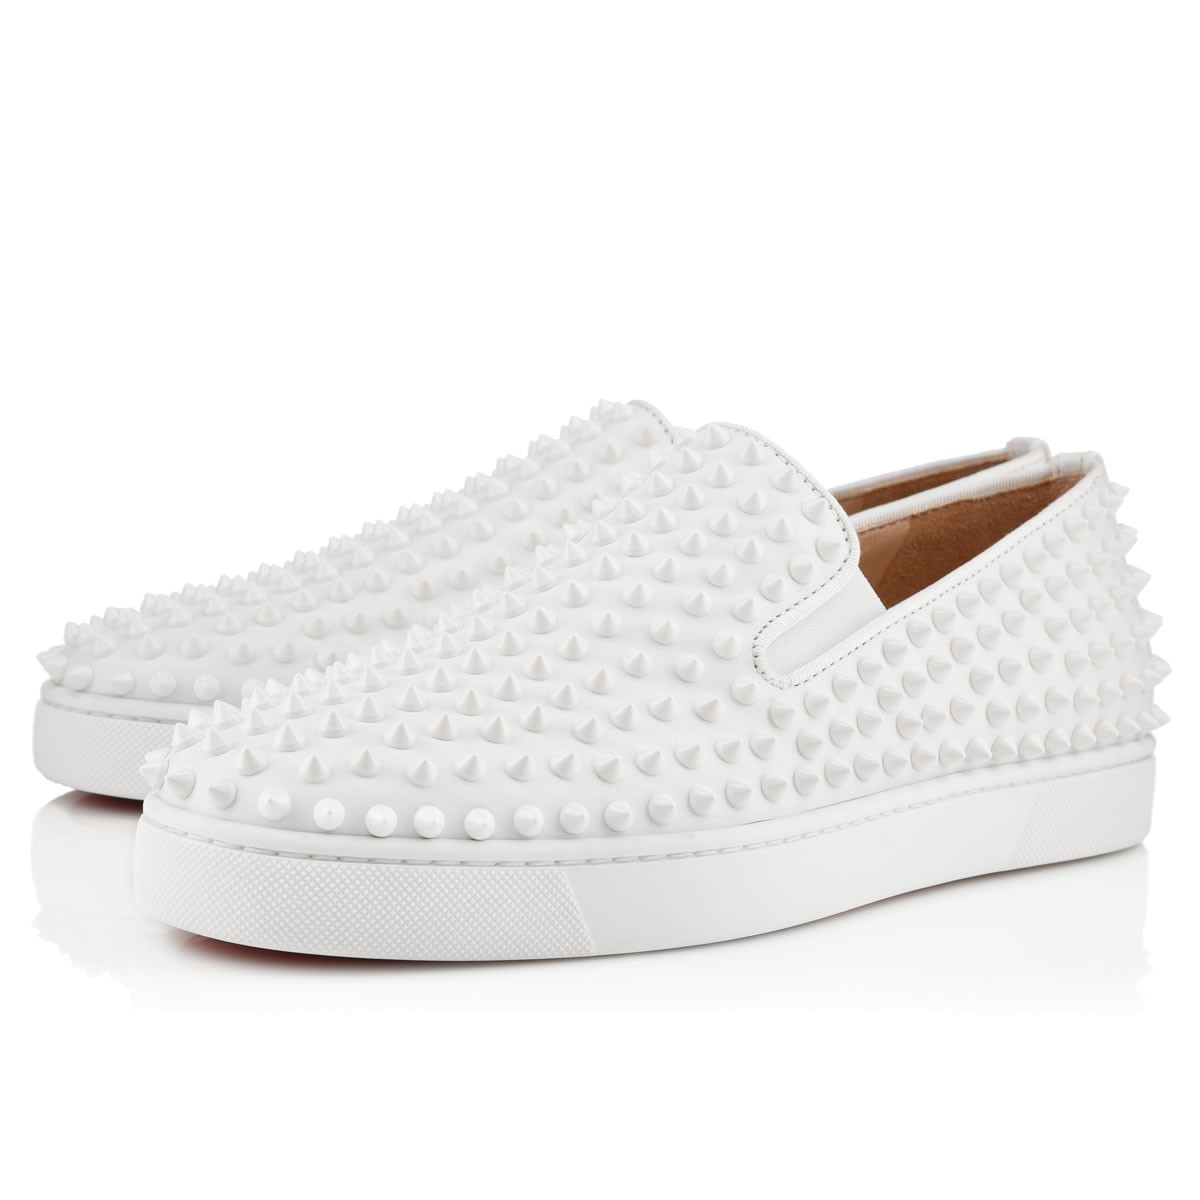 Christian Louboutin Roller Embellished Slip-On Sneakers